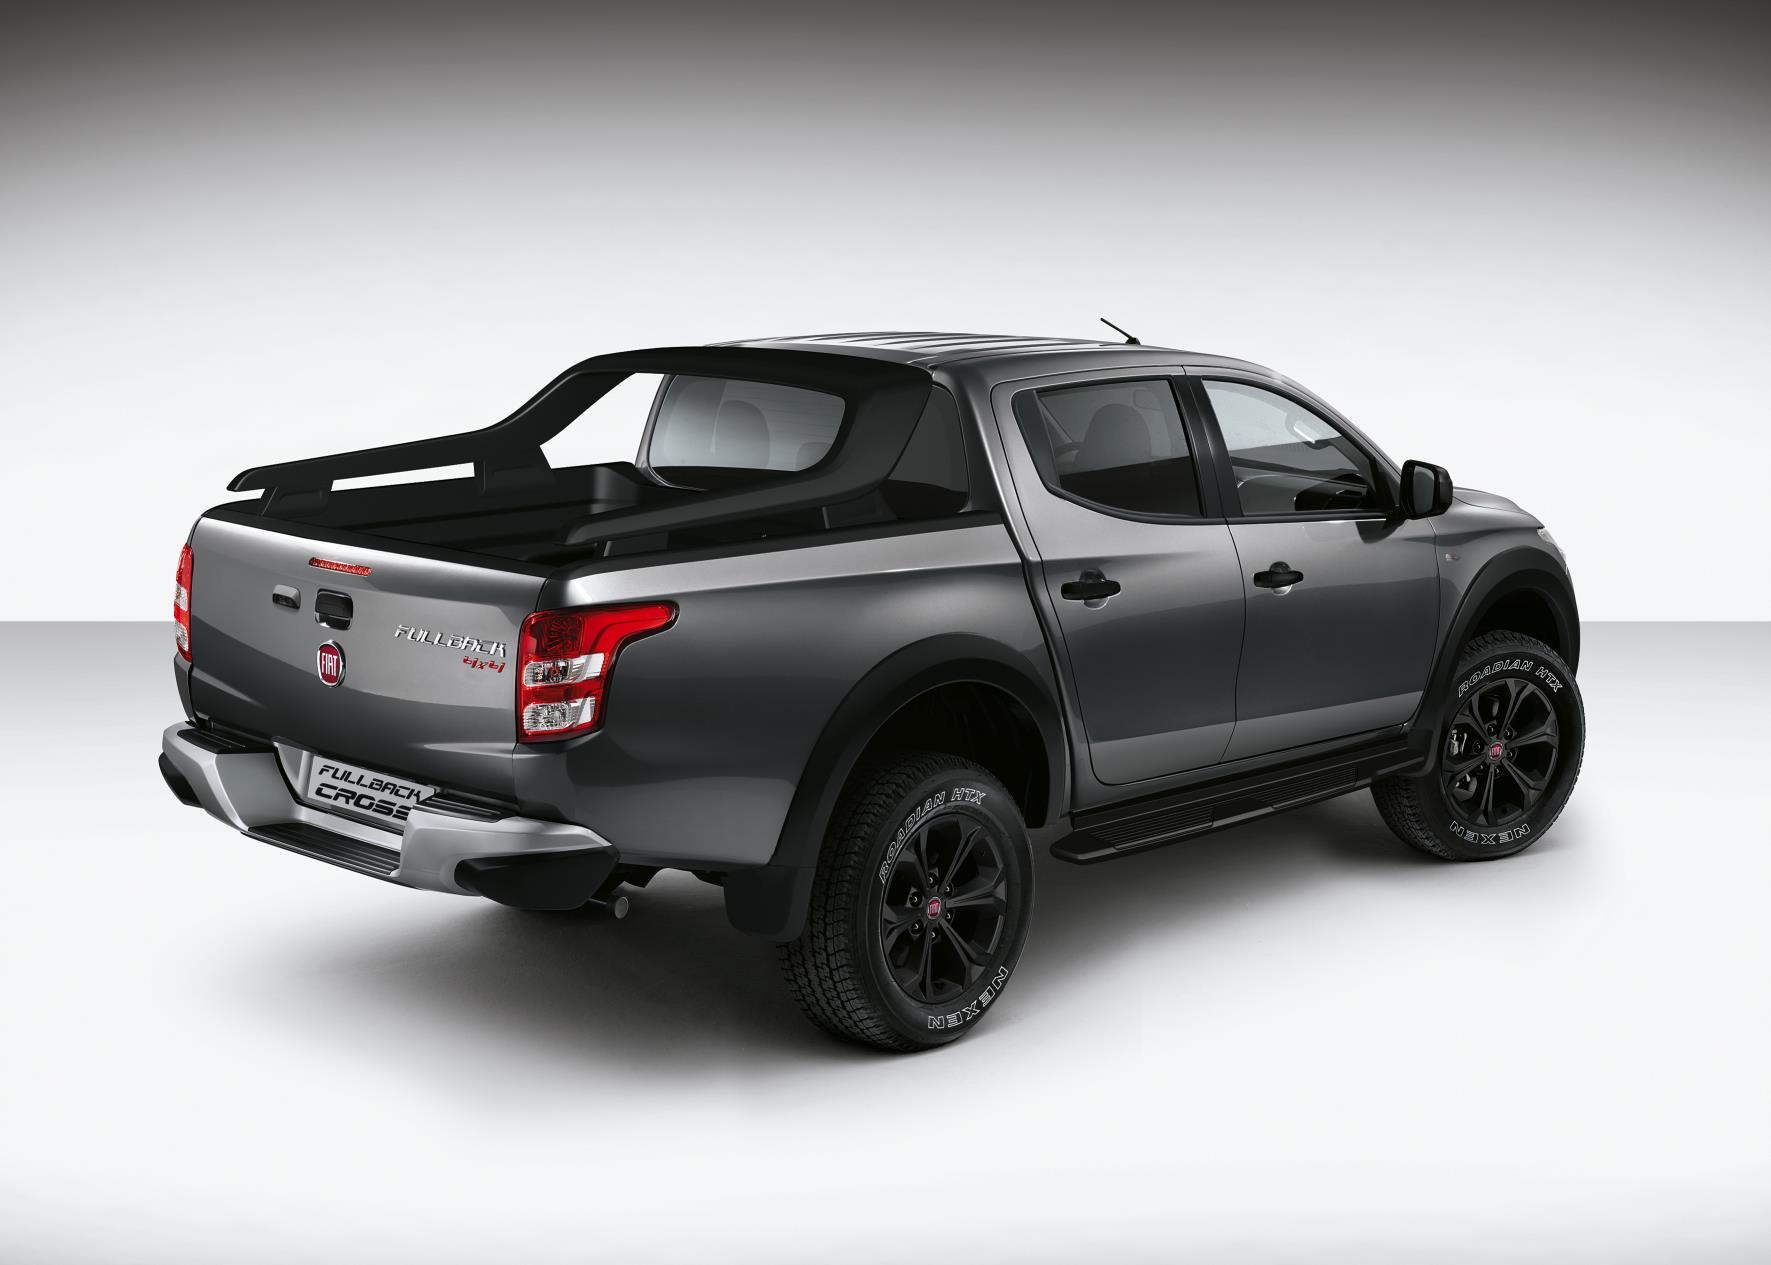 2017 Fiat Fullback Cross 2017 Fiat Fullback Cross ...